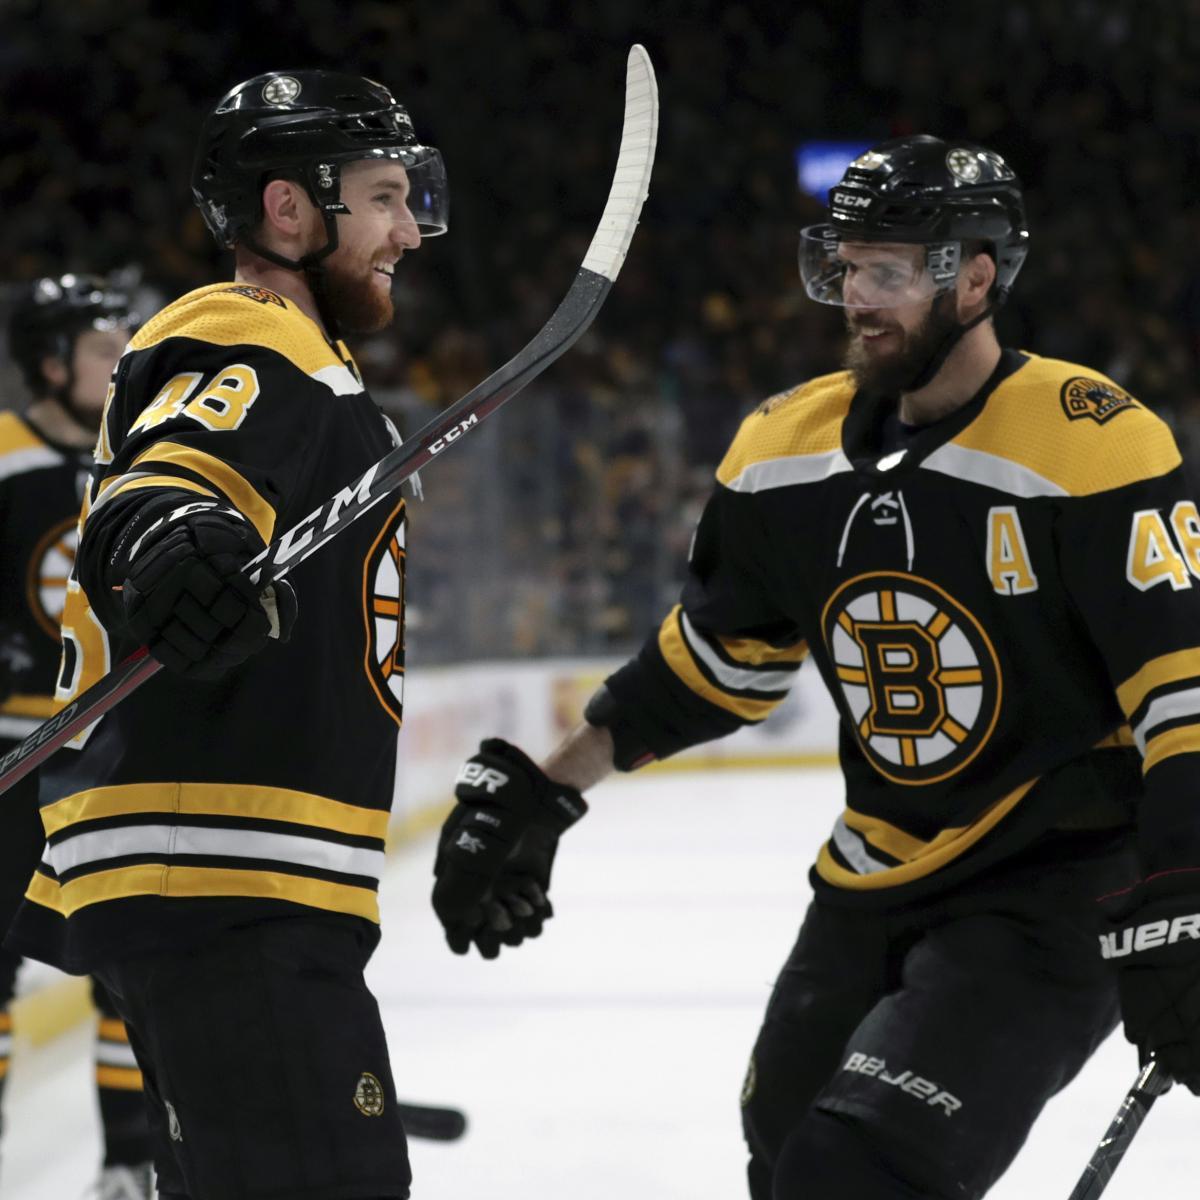 Matt Grzelcyk, Bruins Crush Hurricanes 6-2 In Game 2, Take